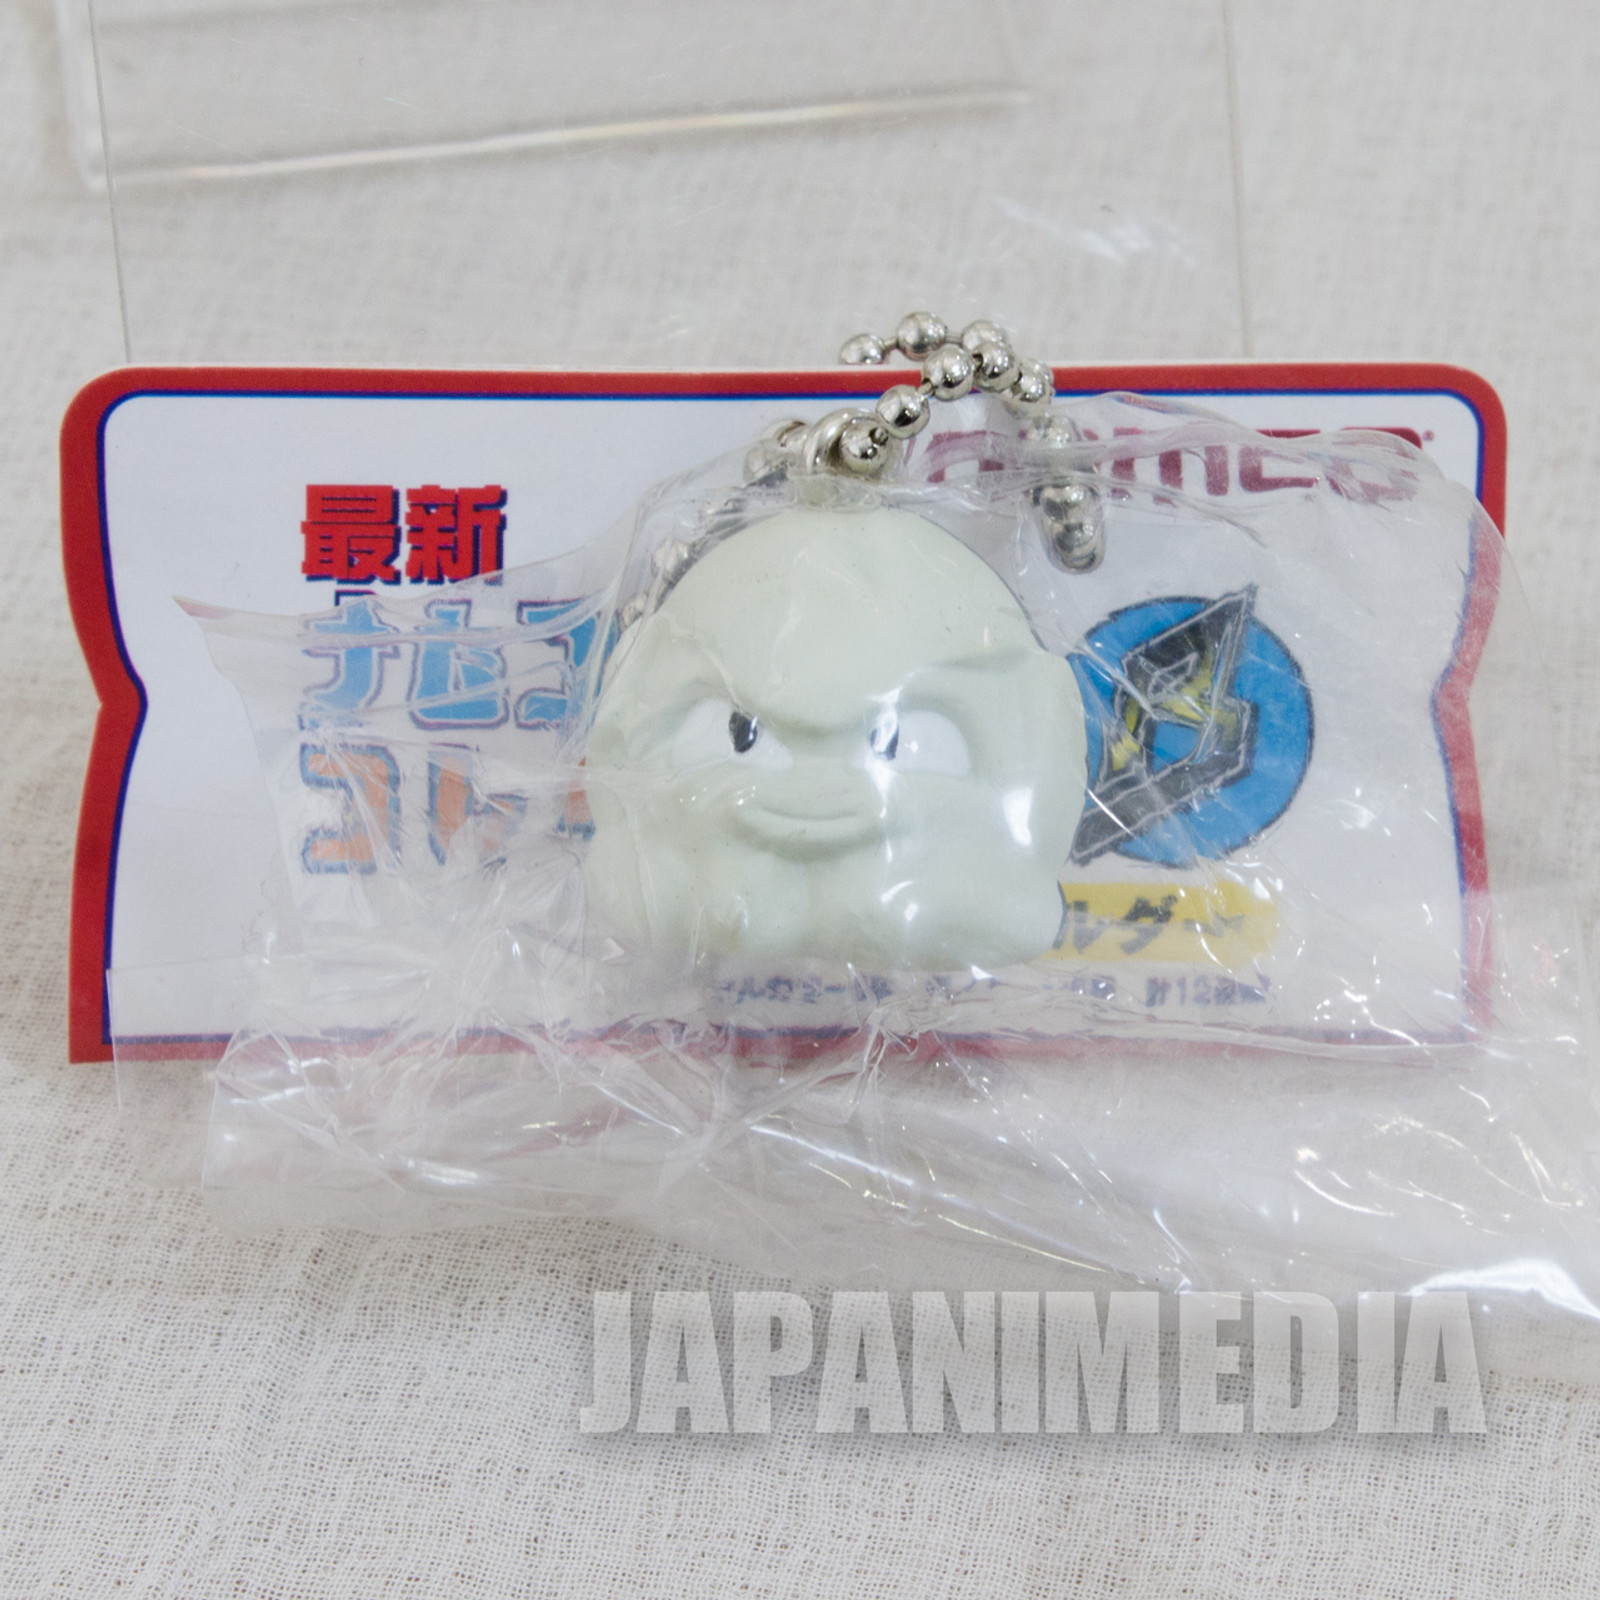 Retro Rare! Tako-Ika Panic Monochrome Figure Ballchain Namco JAPAN